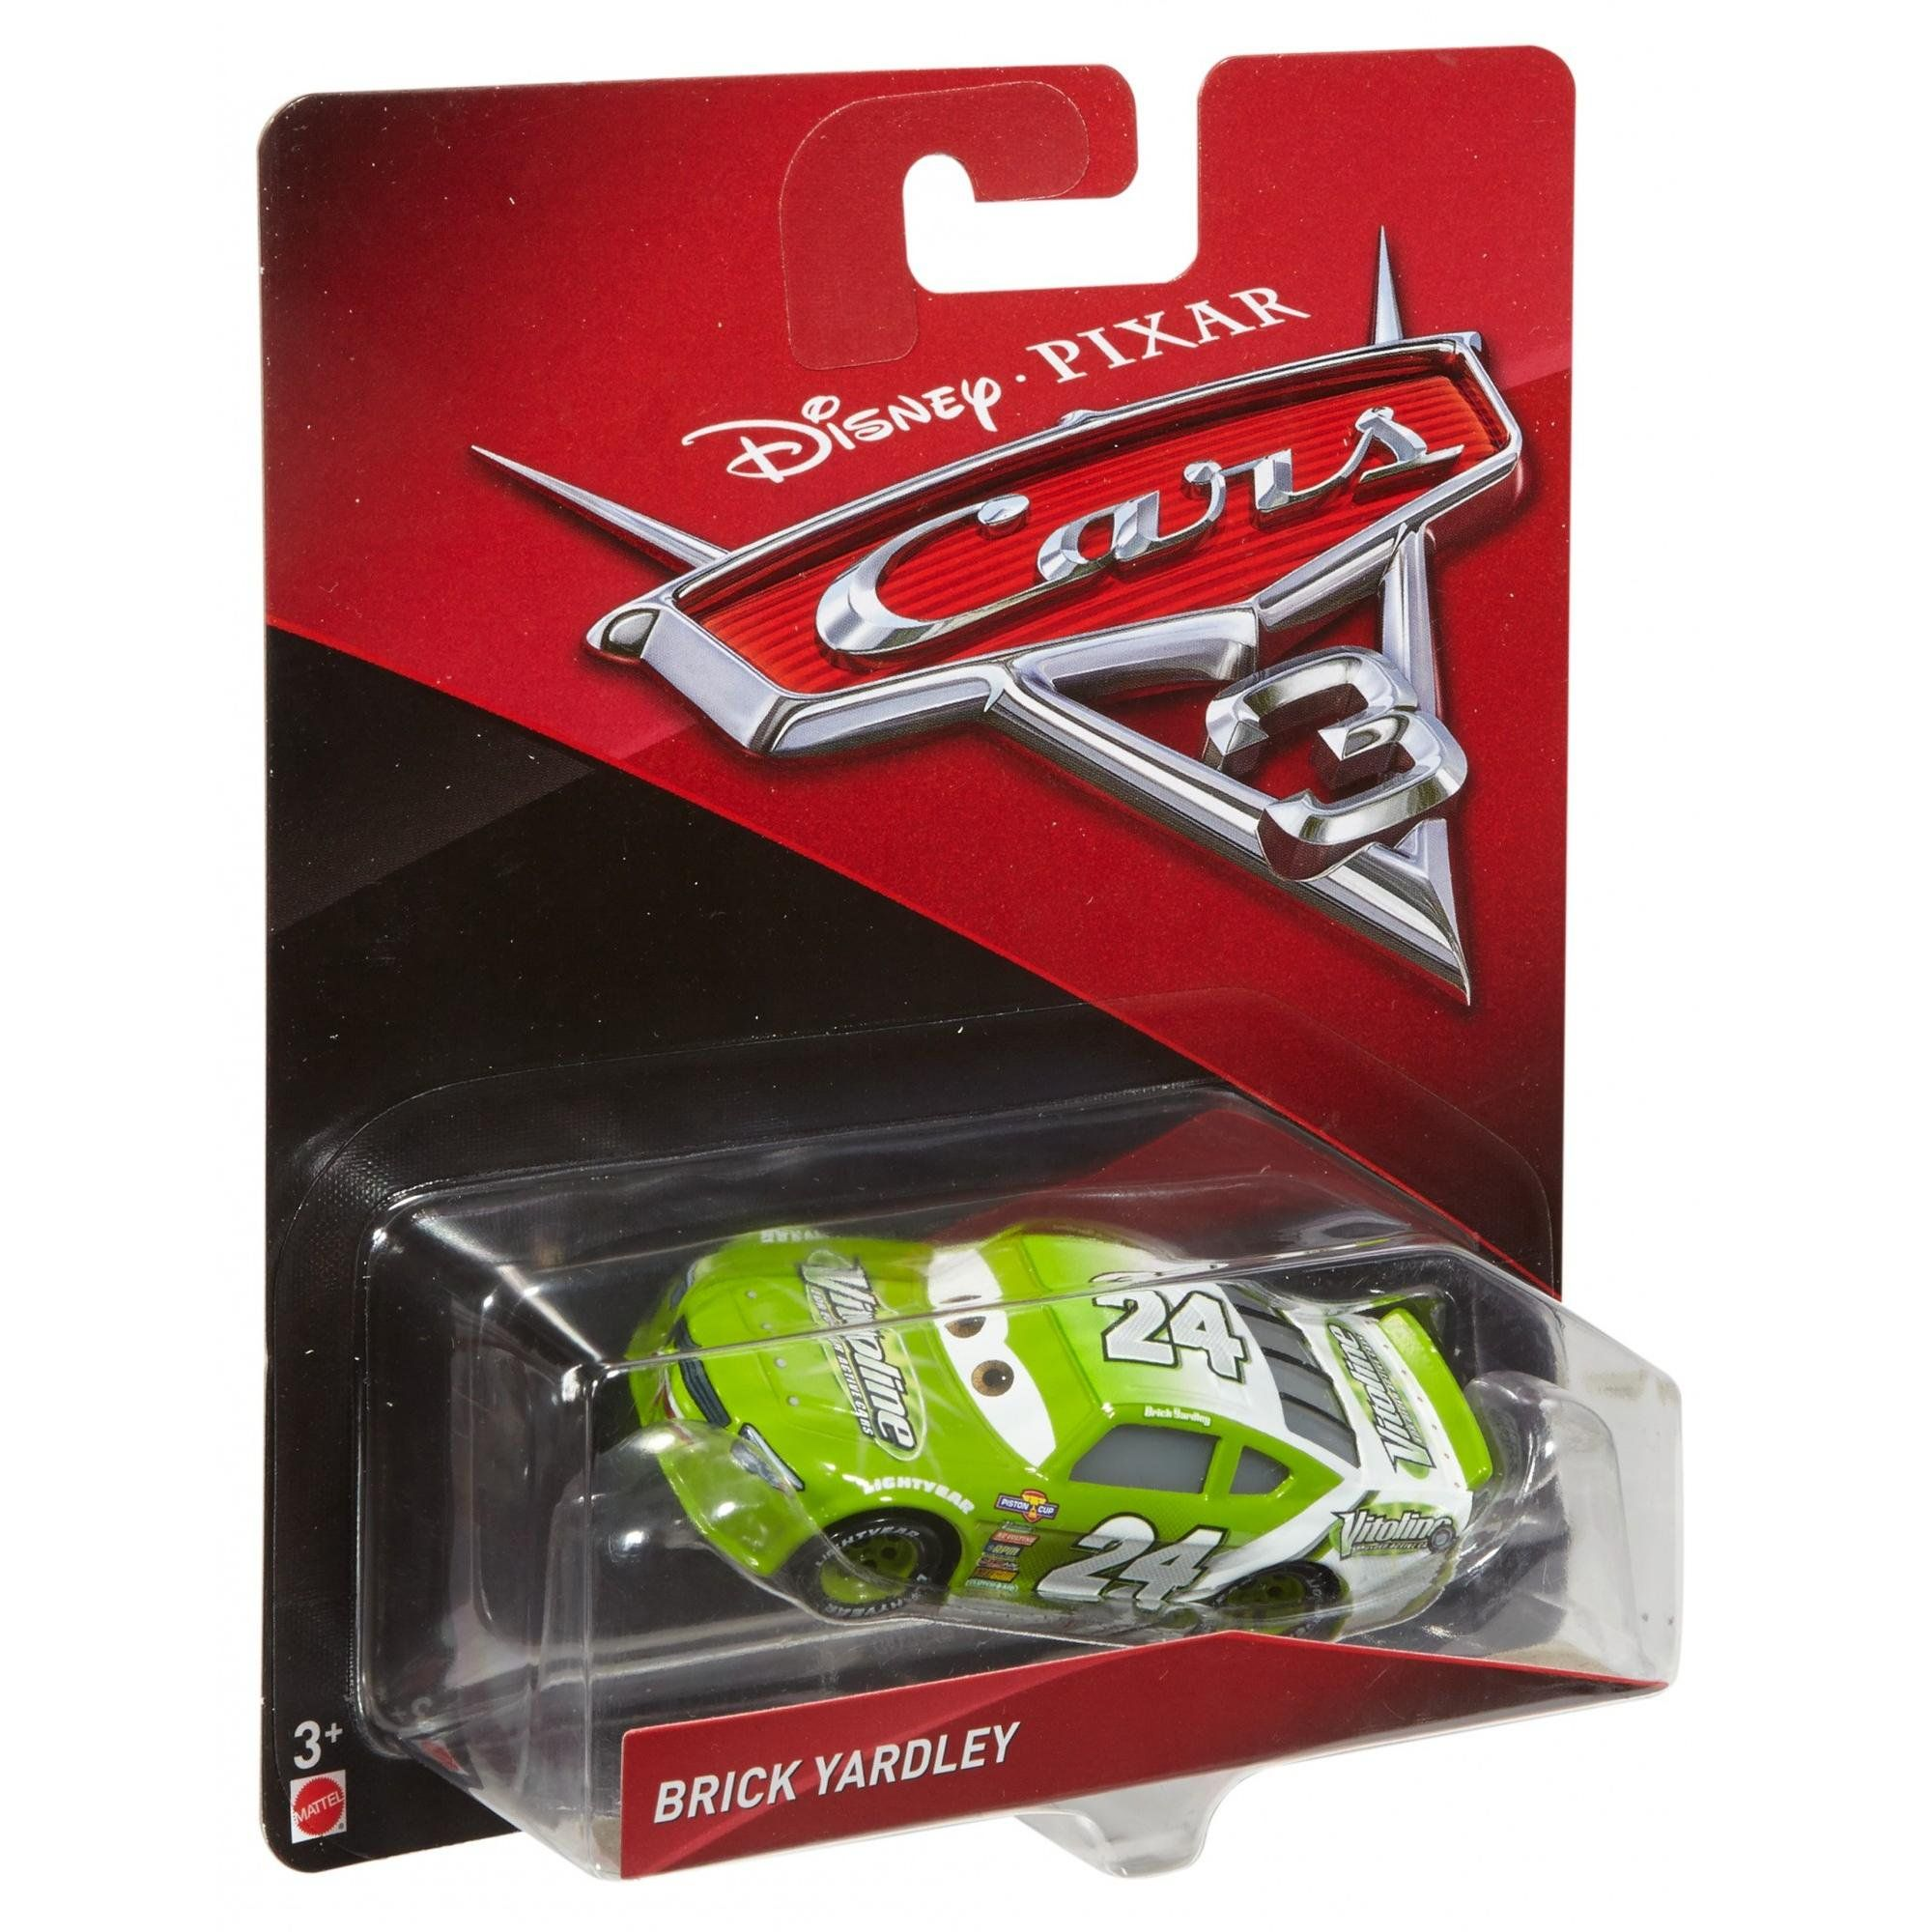 Disney/Pixar Cars 3 Brick Yardley DieCast Character